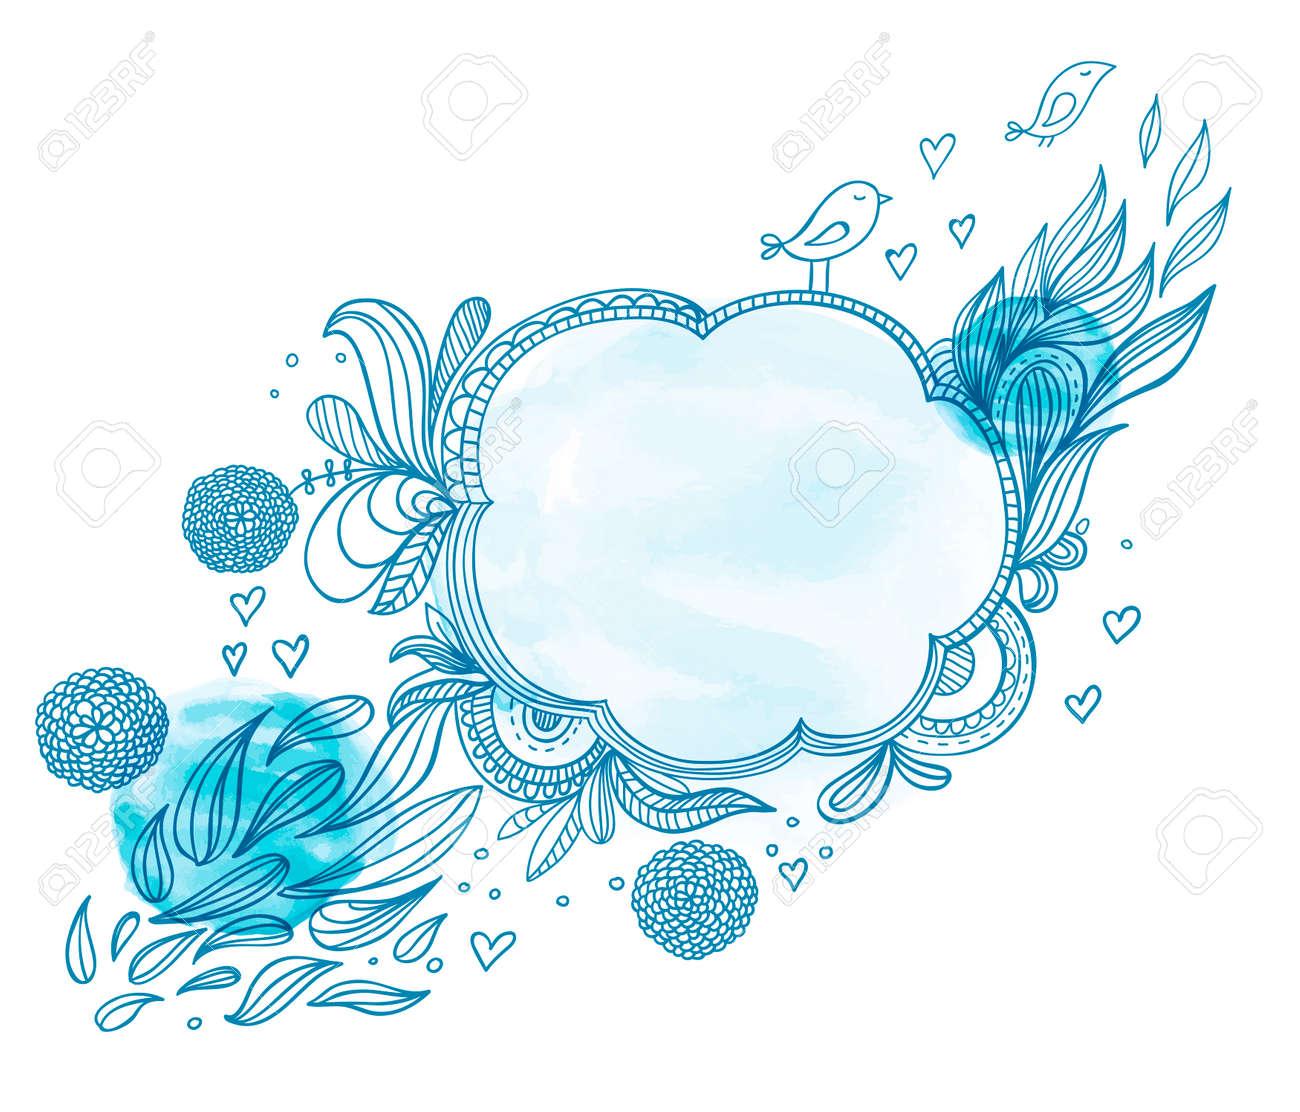 Doodle frame.Vector illustration, flowers and birds. hand drawn frames. - 39374193